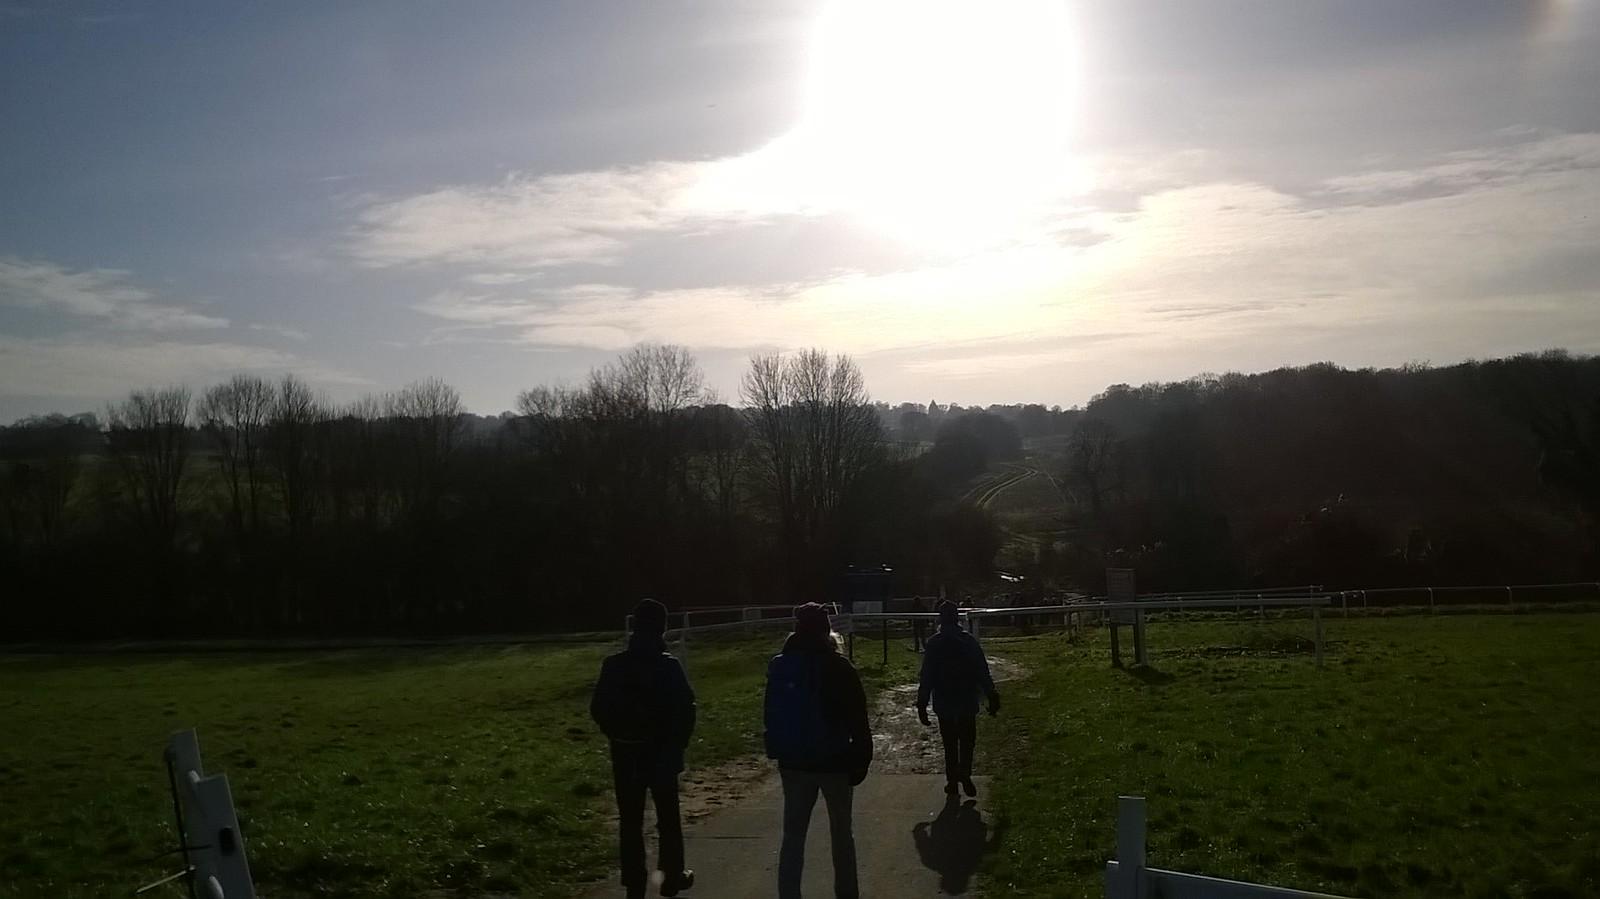 Into the winter sun descending from Epsom Down